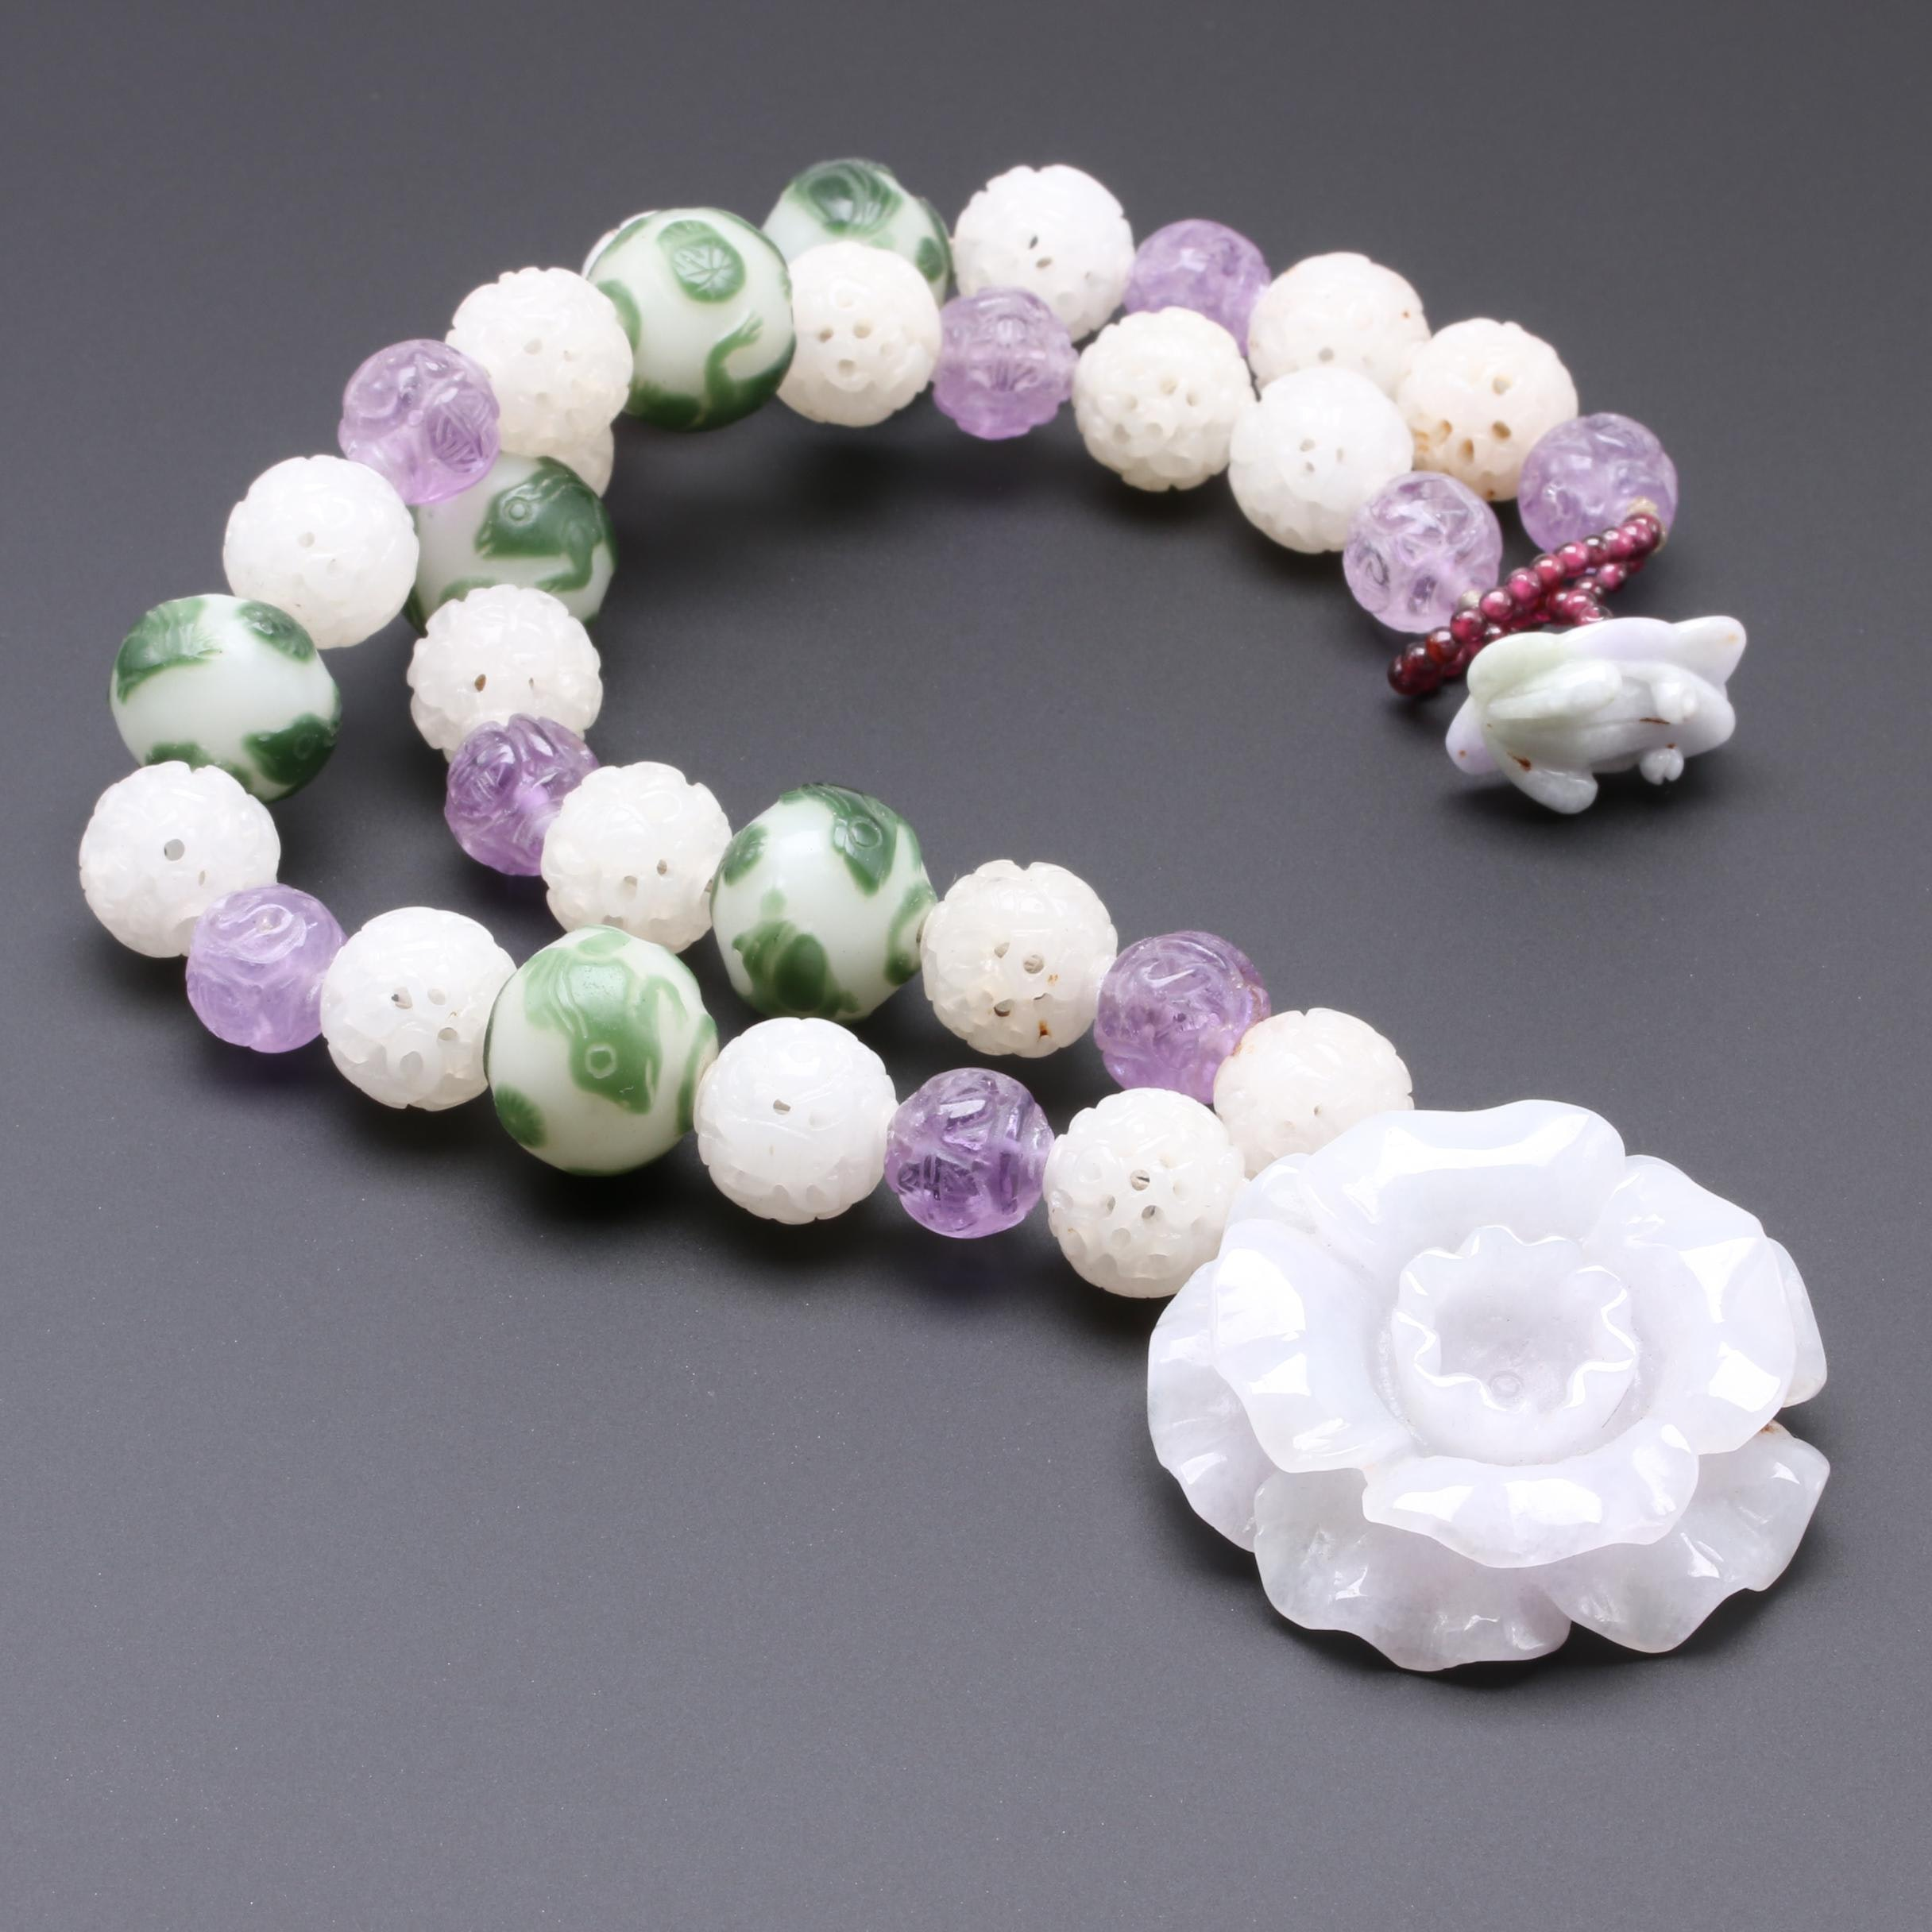 Carved Lavender Jadeite, Amethyst, and Bowenite Flower Necklace